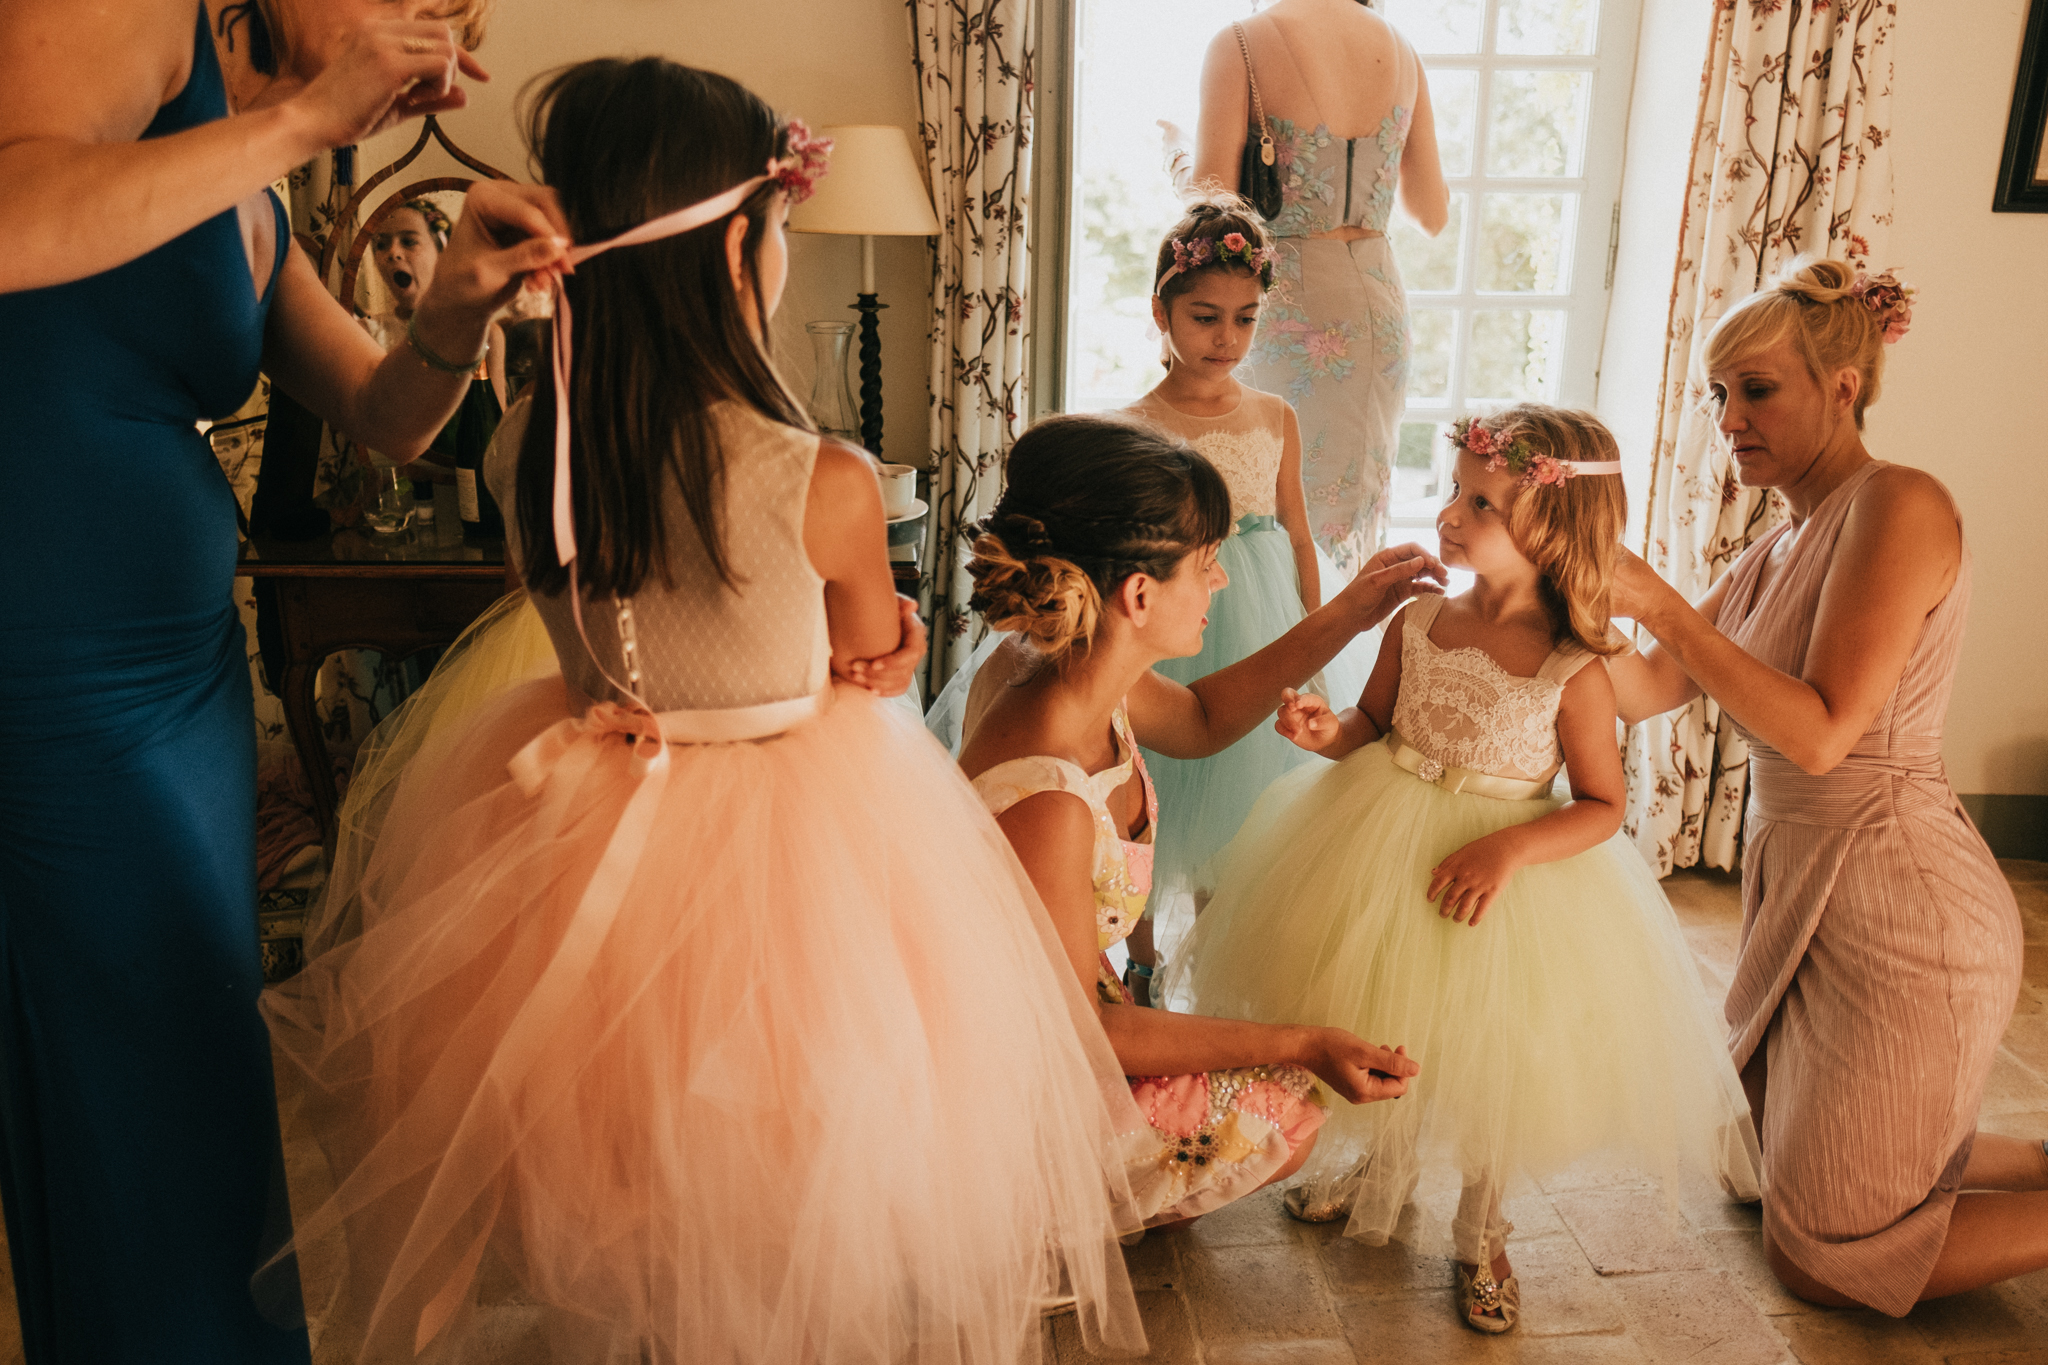 Domaine-de-la-Tuiliere-South-of-France-Wedding-Photographer-Ginger-Matthew-Wedding